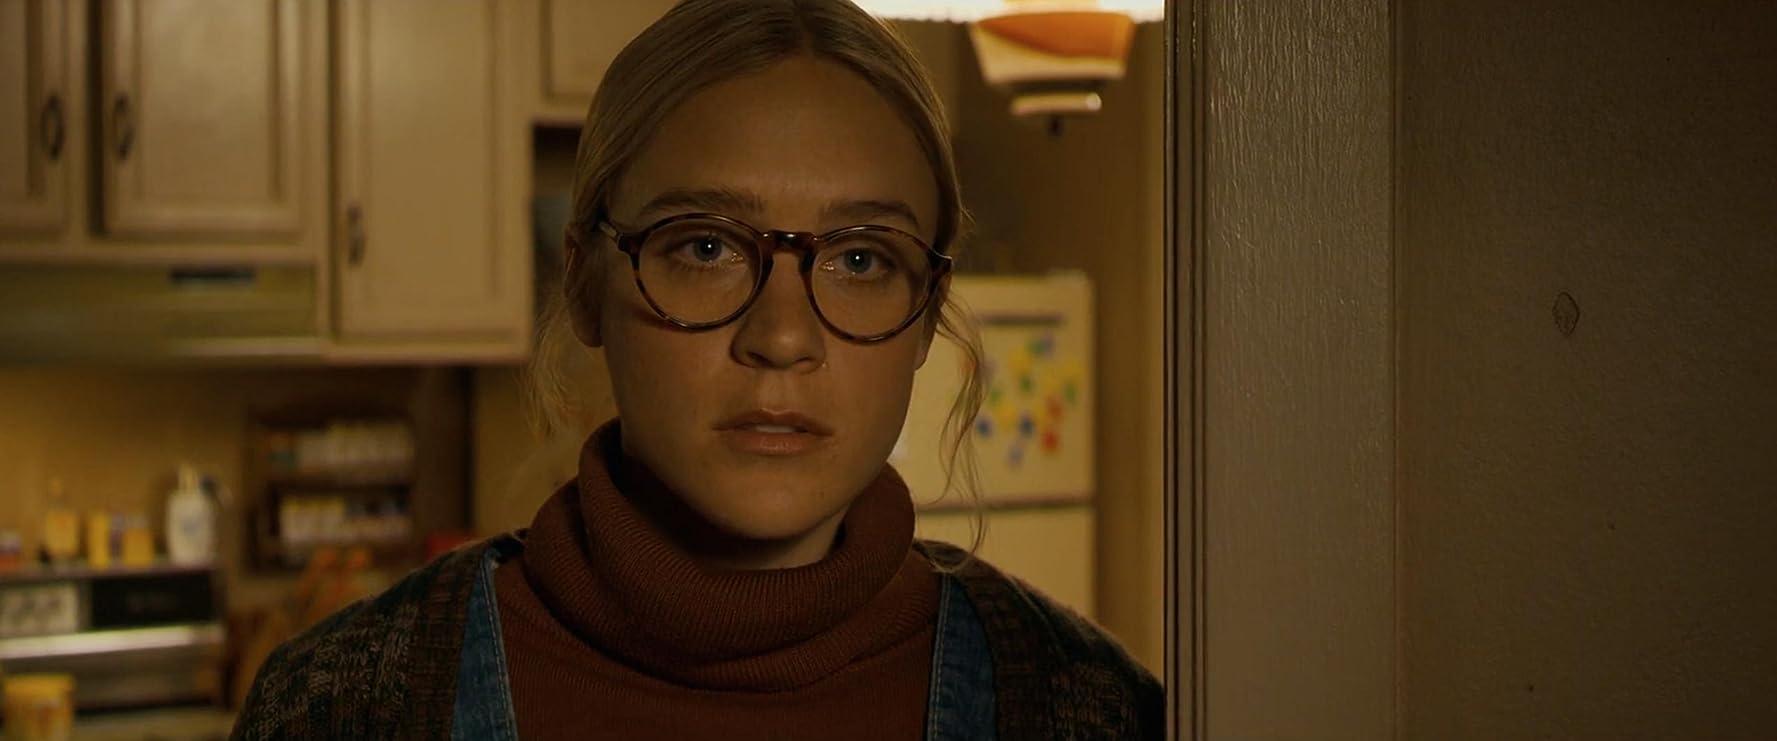 Chloë Sevigny dalam Zodiac (2007)